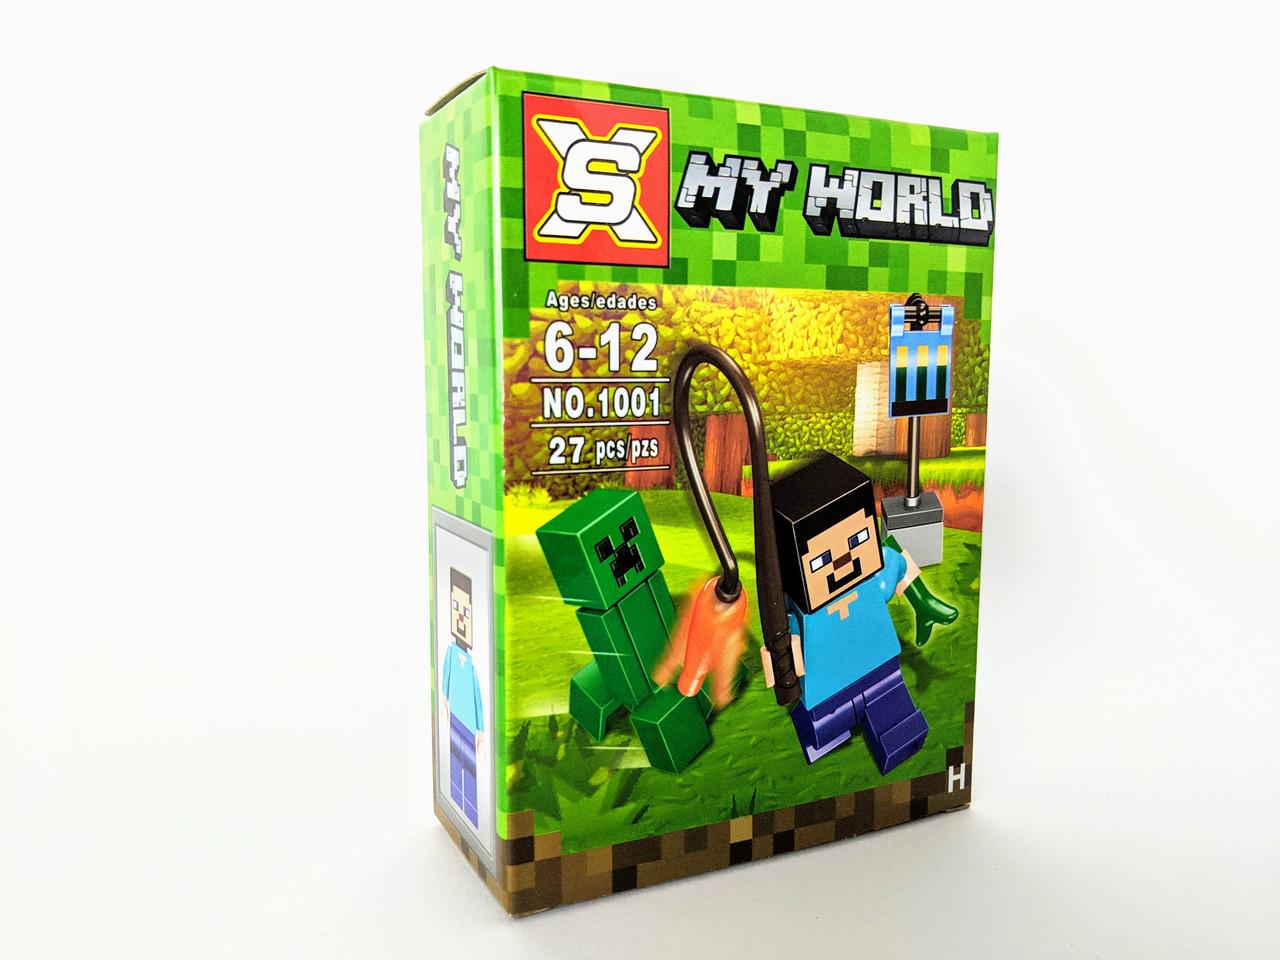 Конструктор My World 27 дет. ( копия Minecraft) NO.1001-2